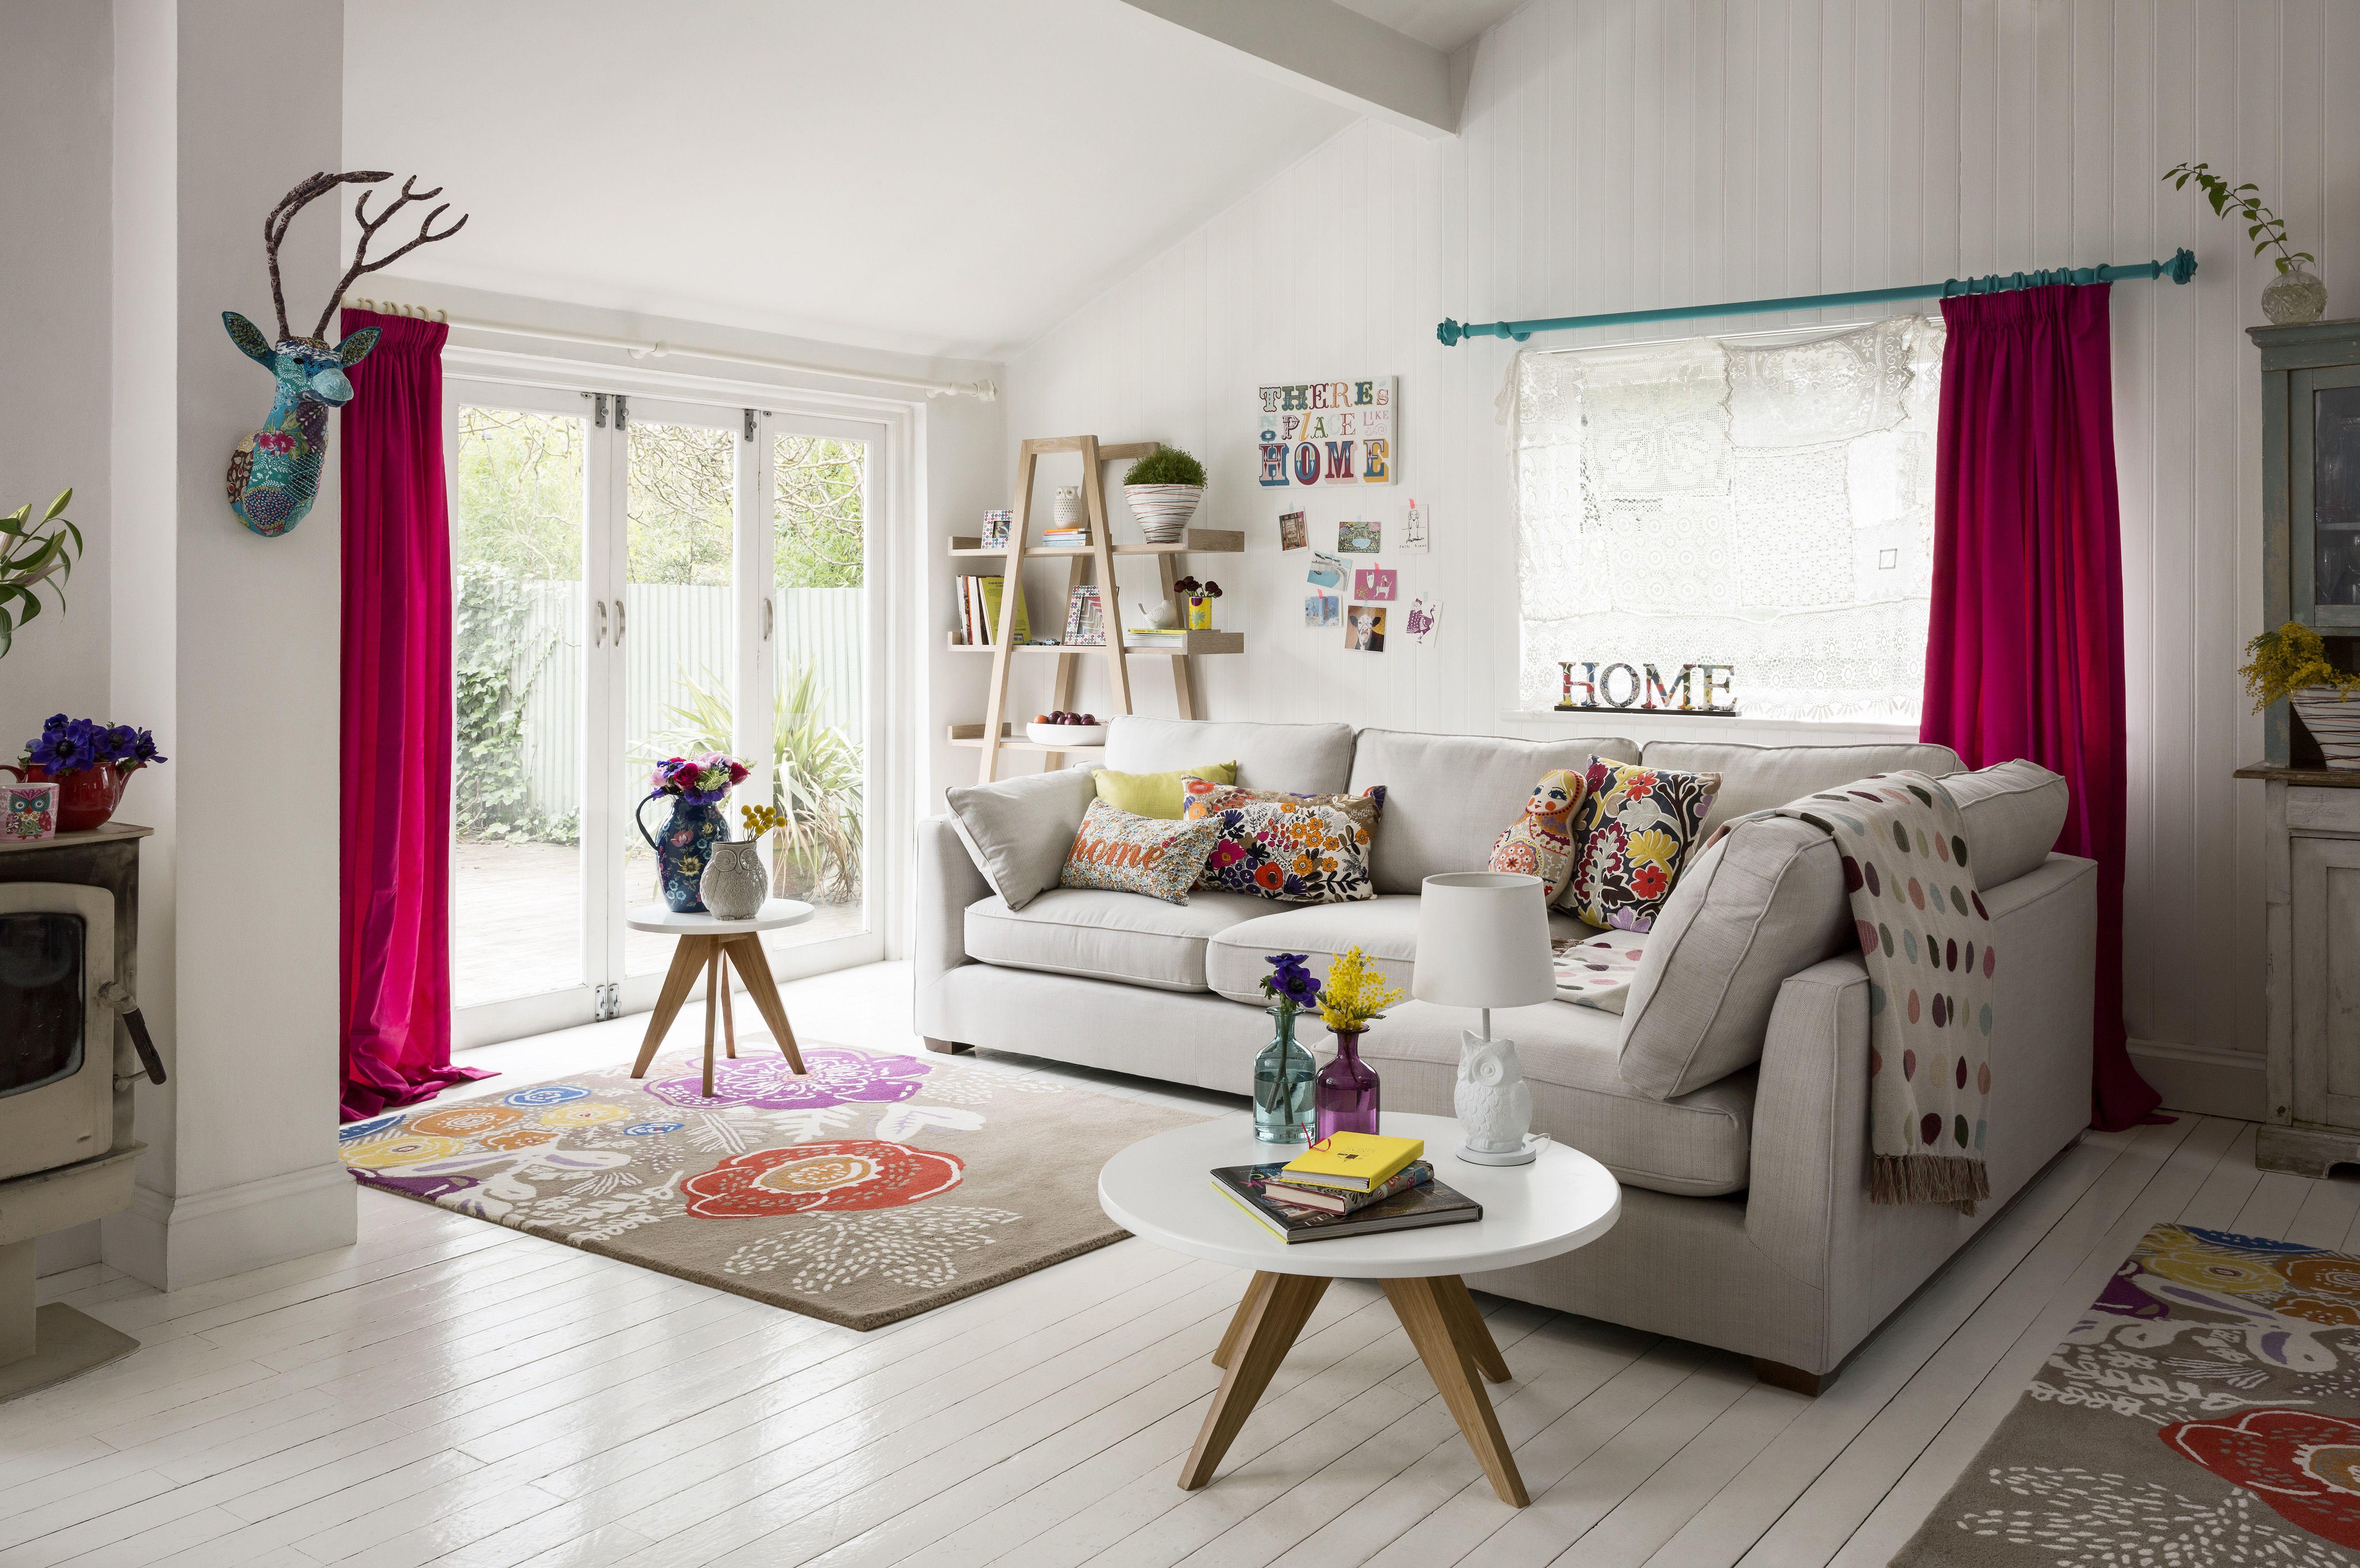 Best Cozy Living Room Design Ideas in 2018 | Living Room Decor Ideas ...